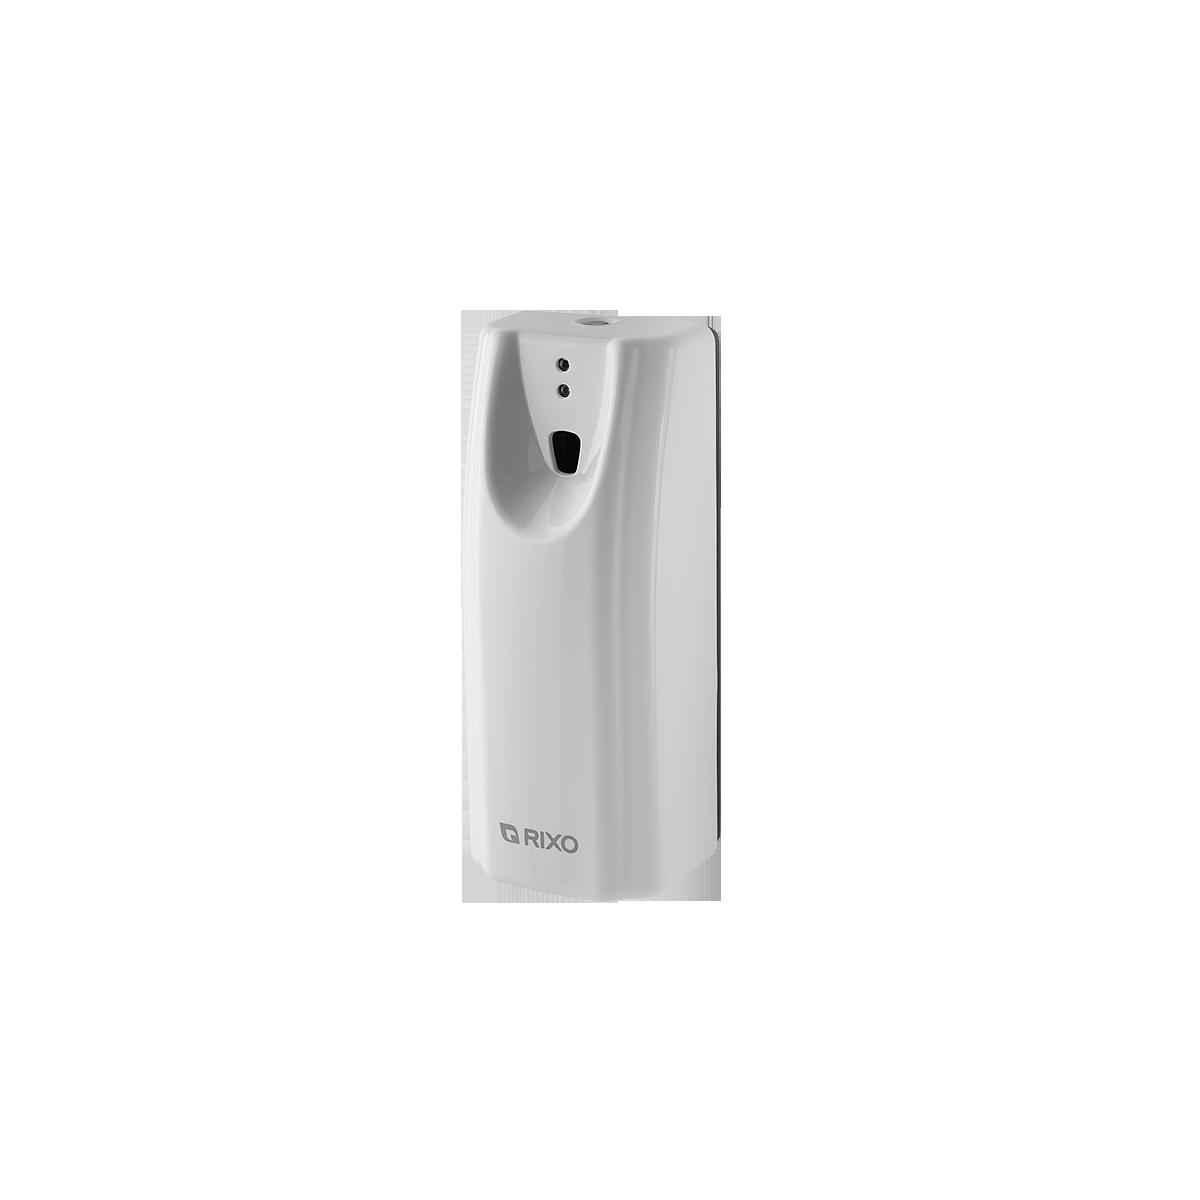 Автоматический освежитель воздуха Rixo Maggio A101W A101W Rixo